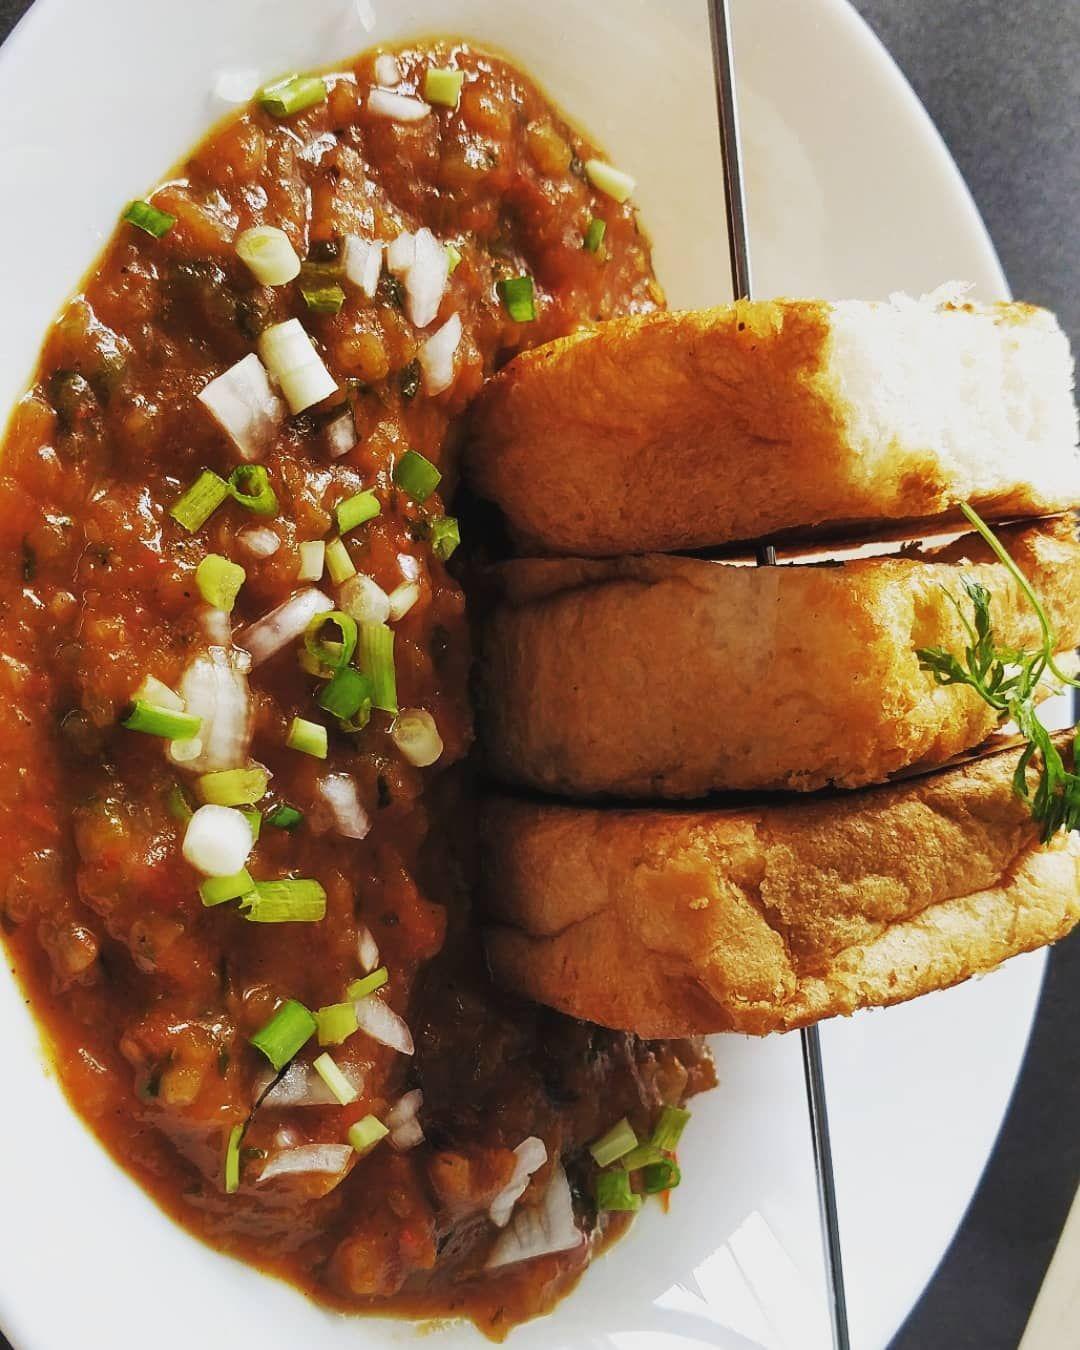 Any Pav bhaji lover here? My all time favorite 😋😋😋😋 #sandwich #mumbaifoodlovers #indianfoodbloggers...